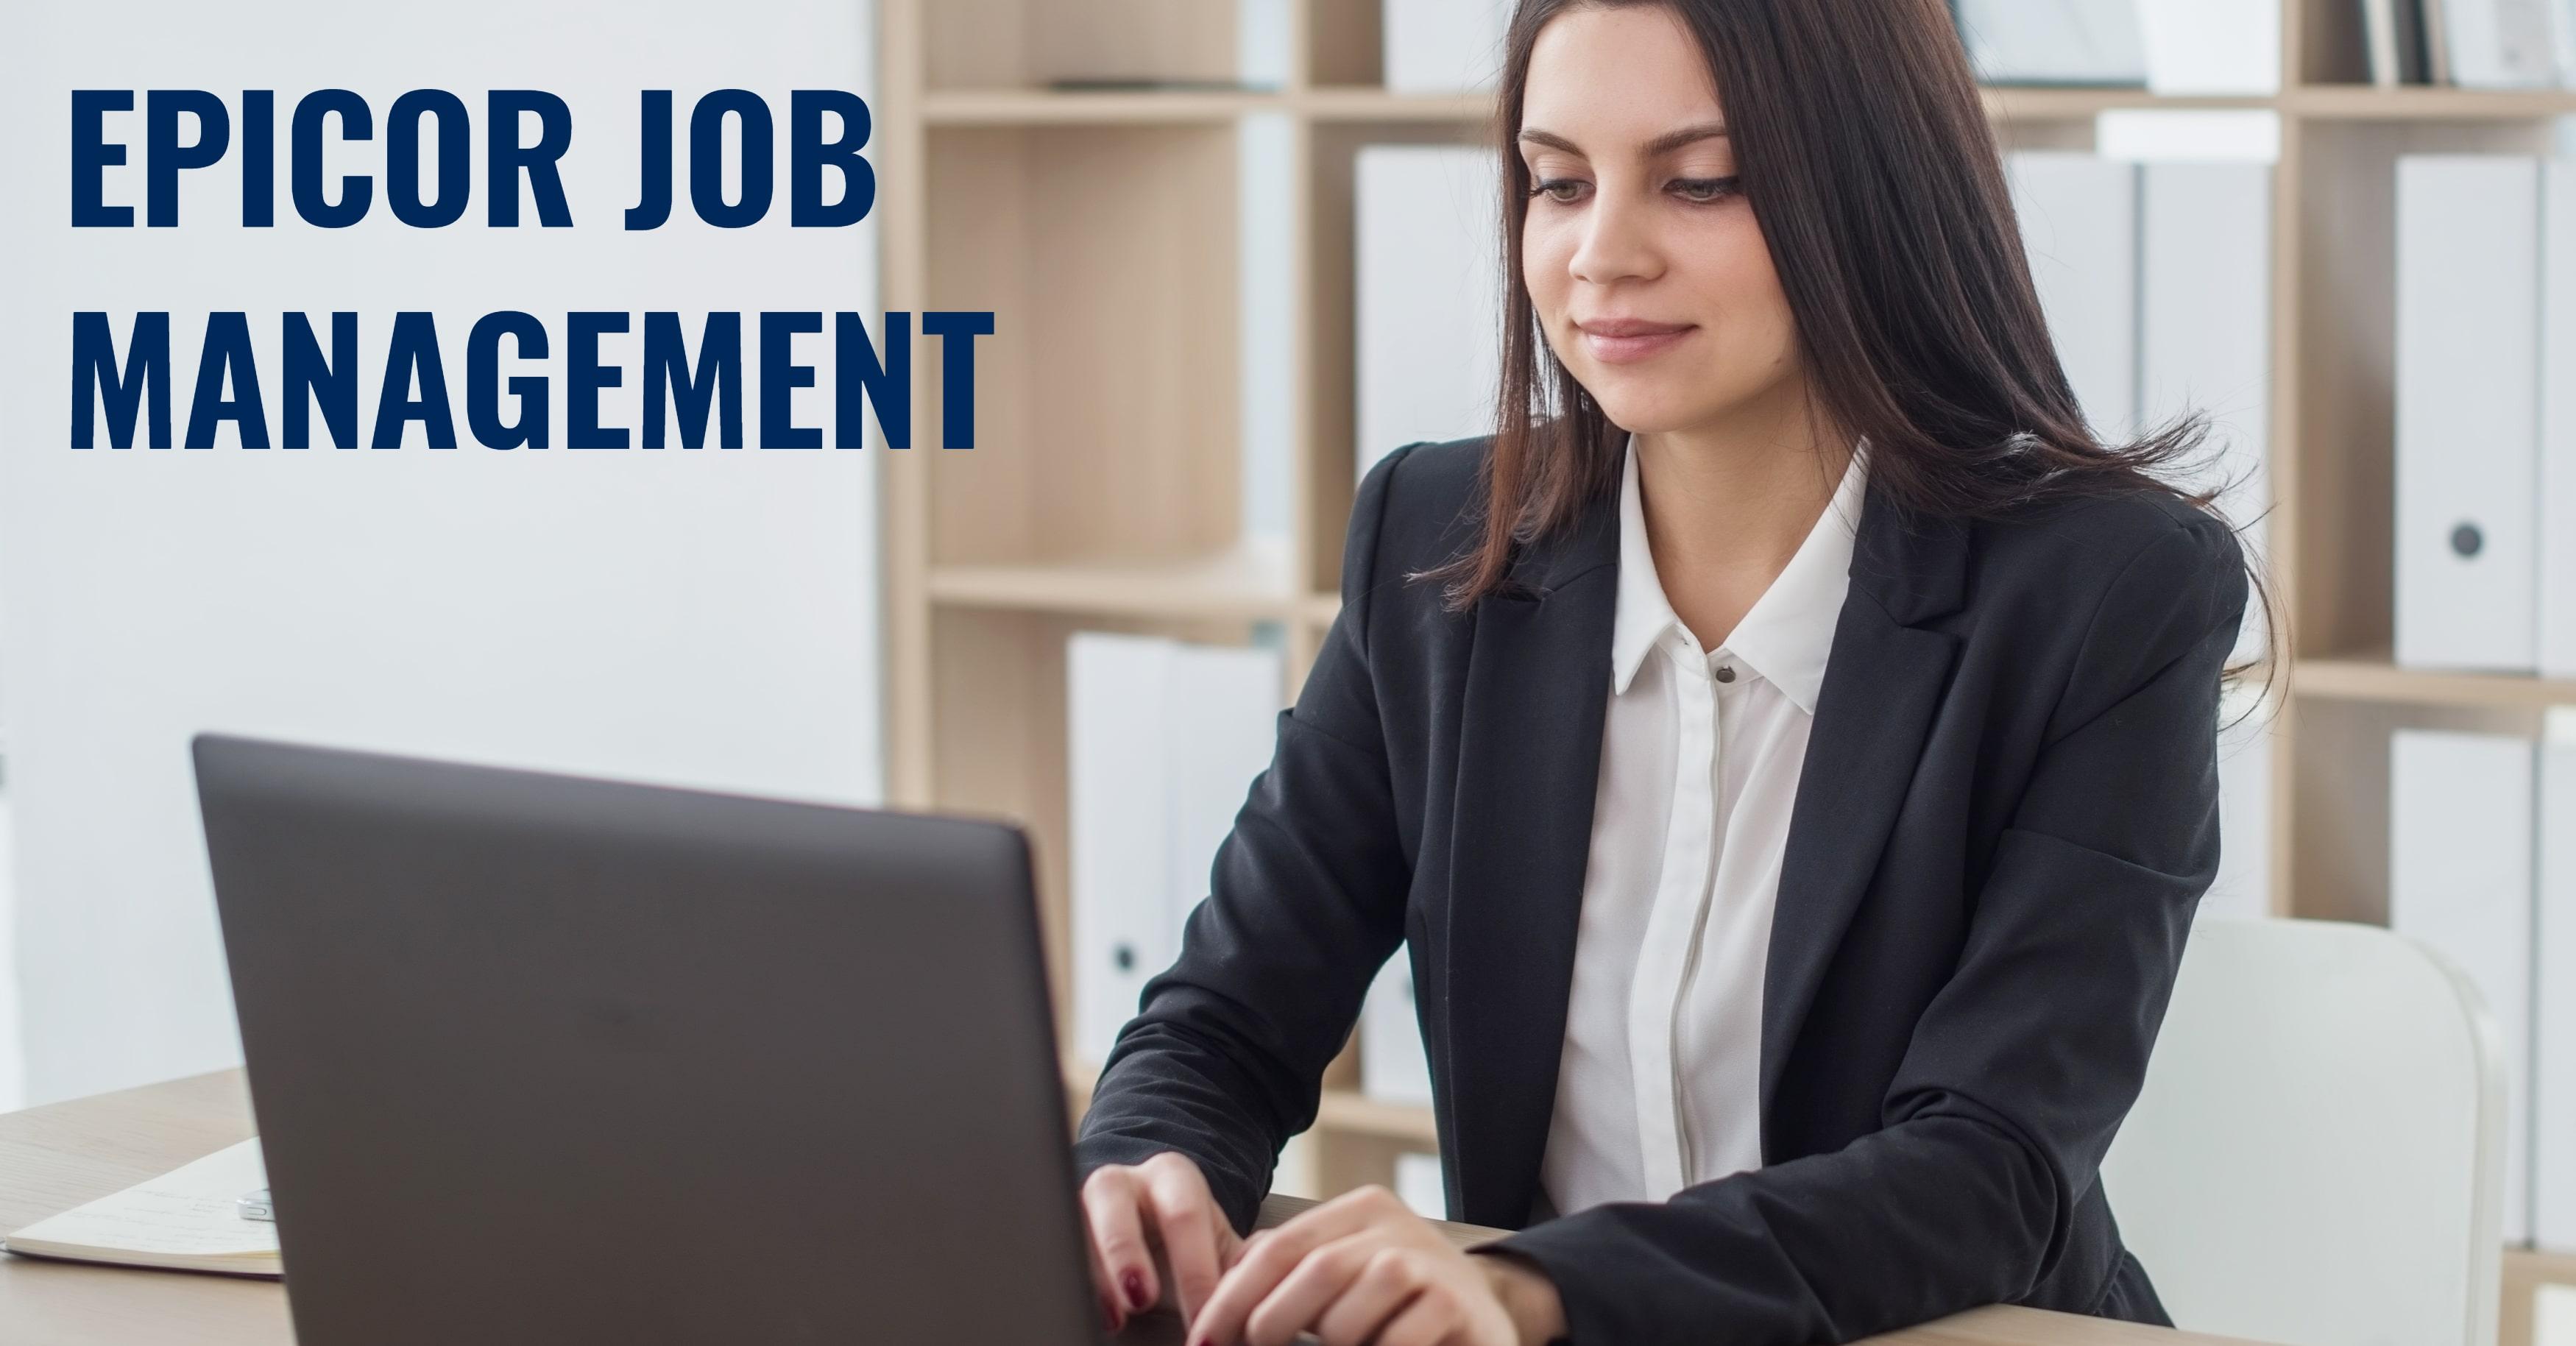 Epicor Job Management